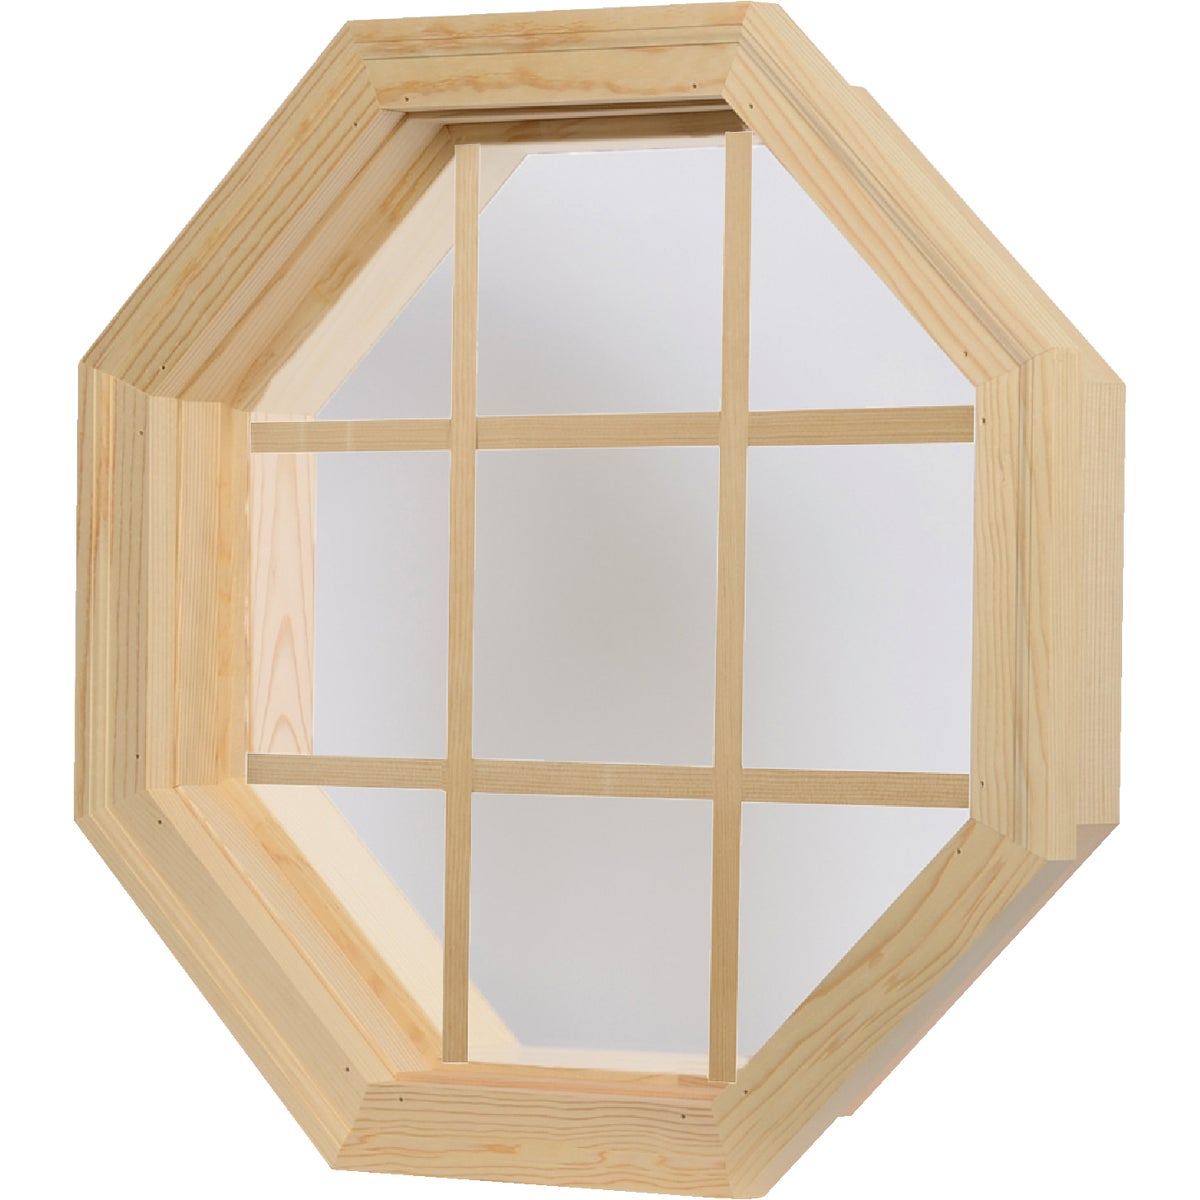 Wd Octagon Single Window